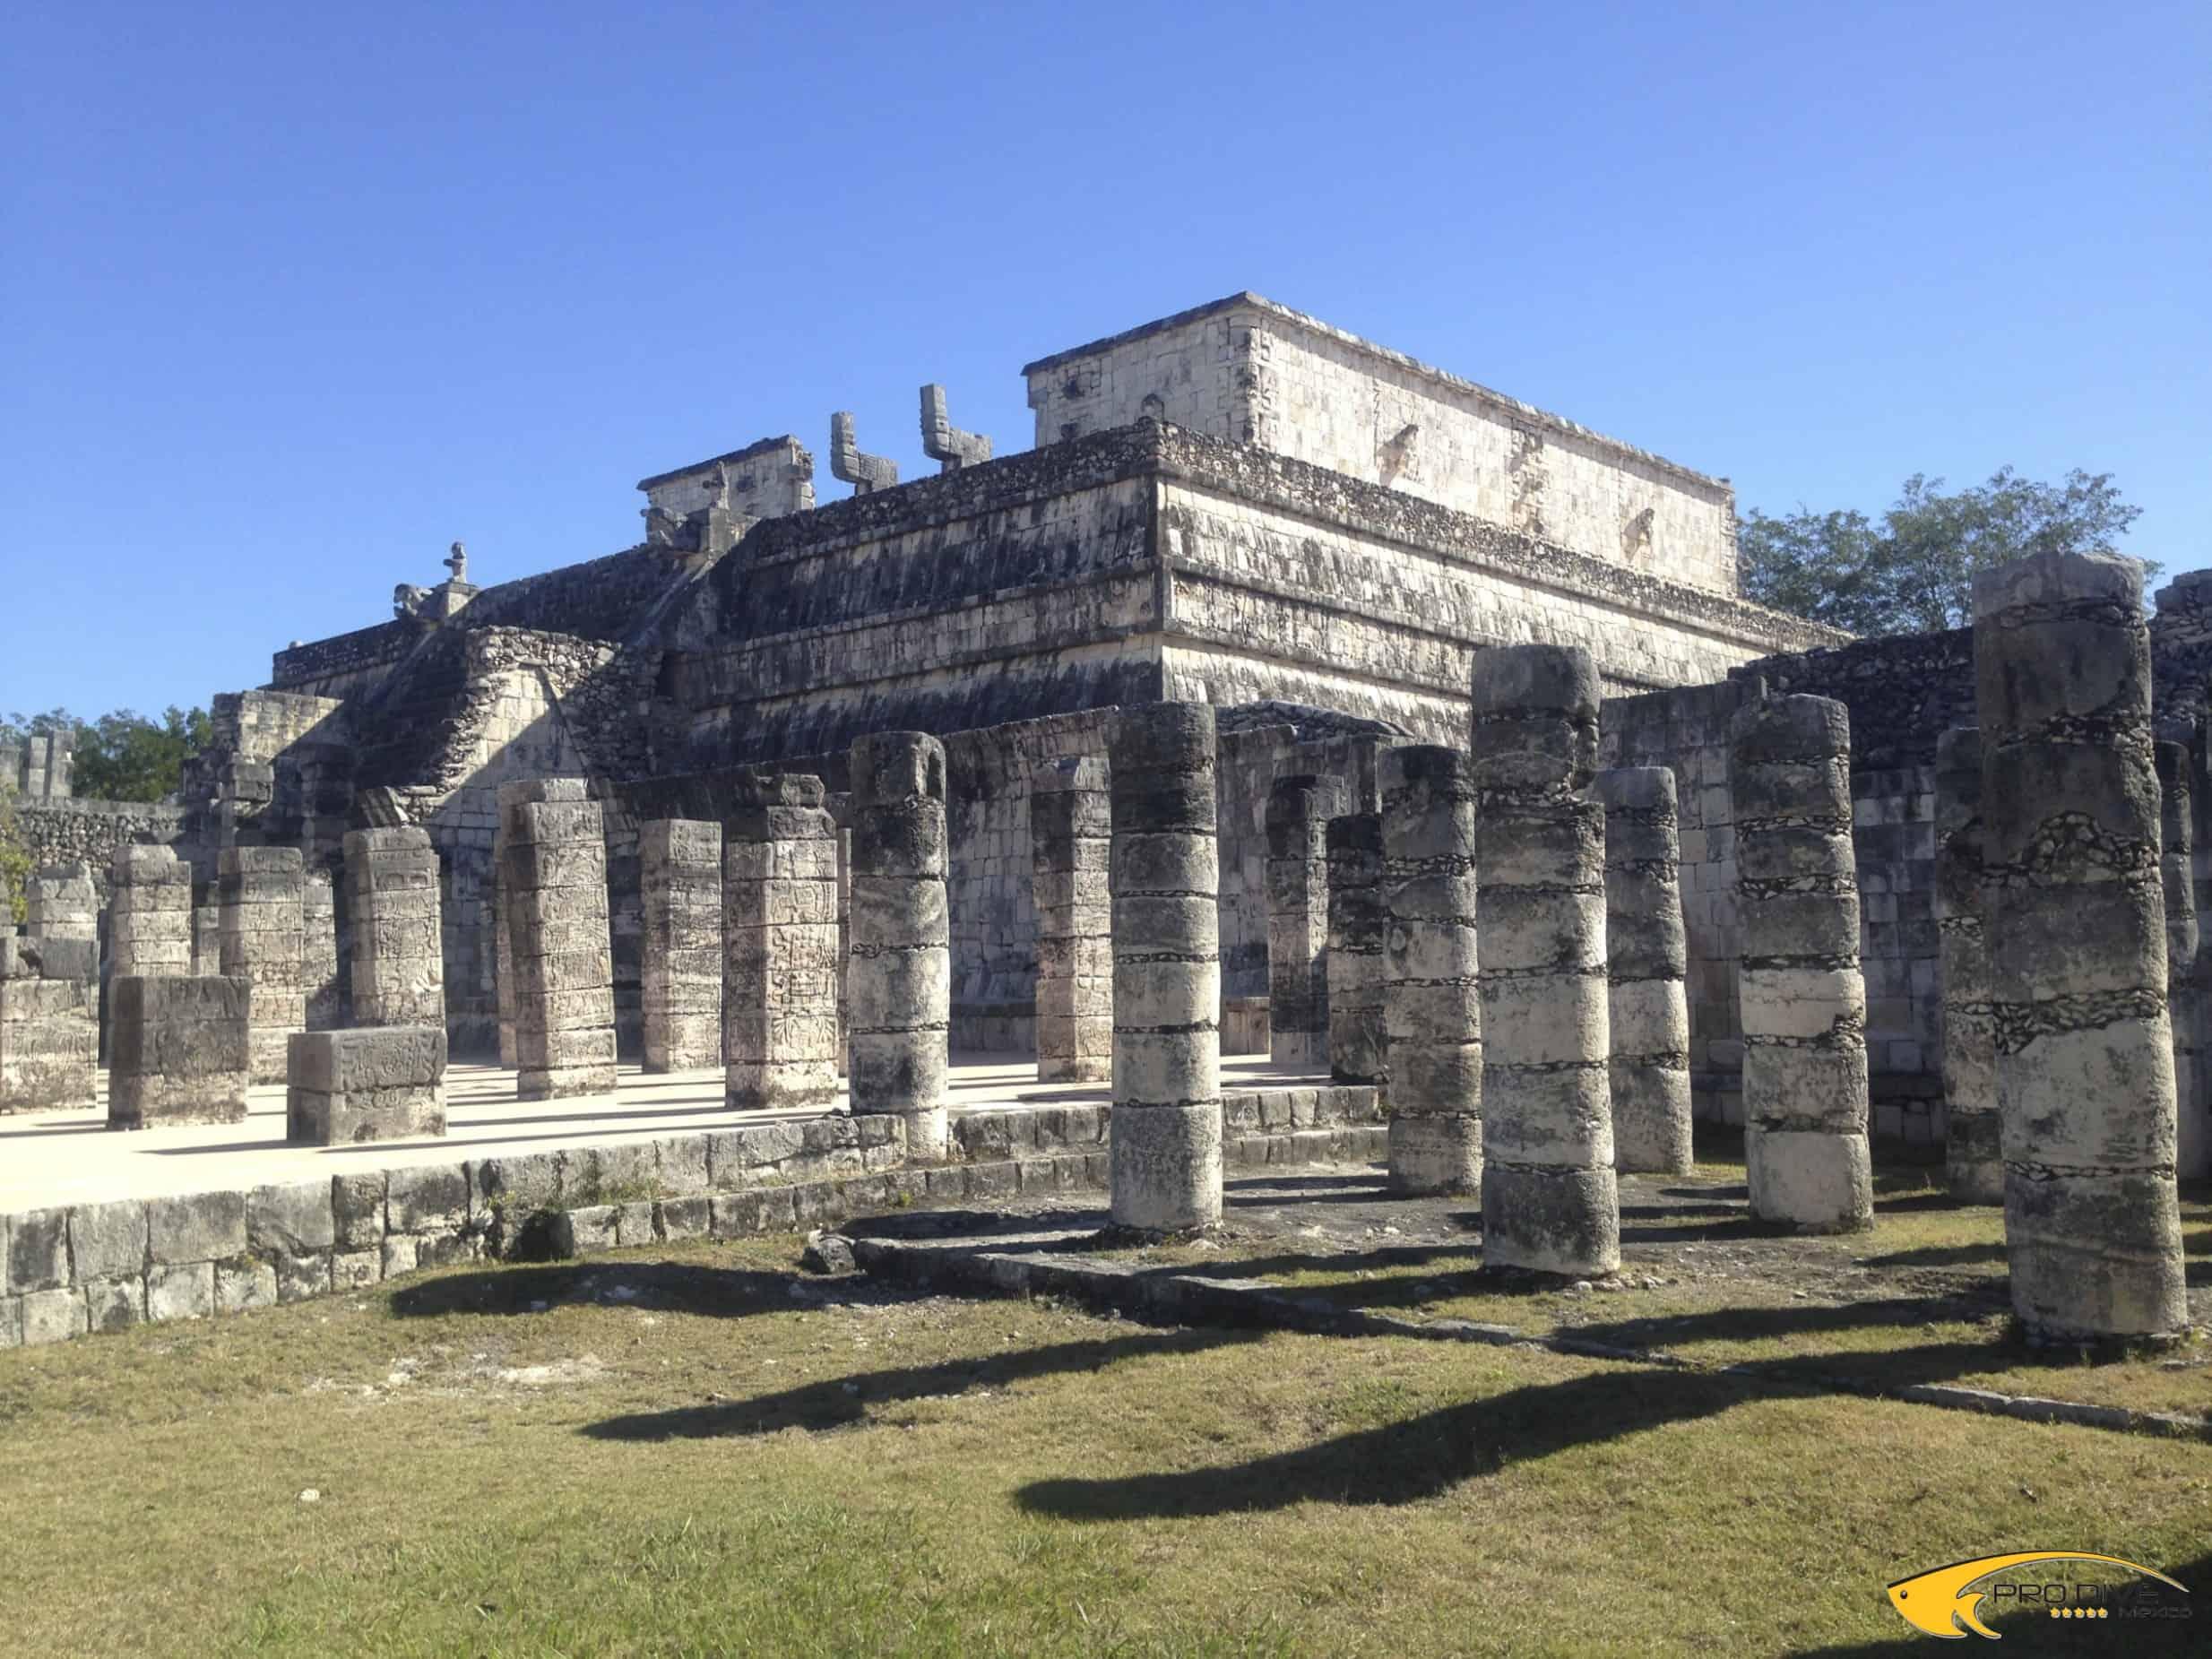 2018 Excursion >> Chichen Itzá - Pro Dive International